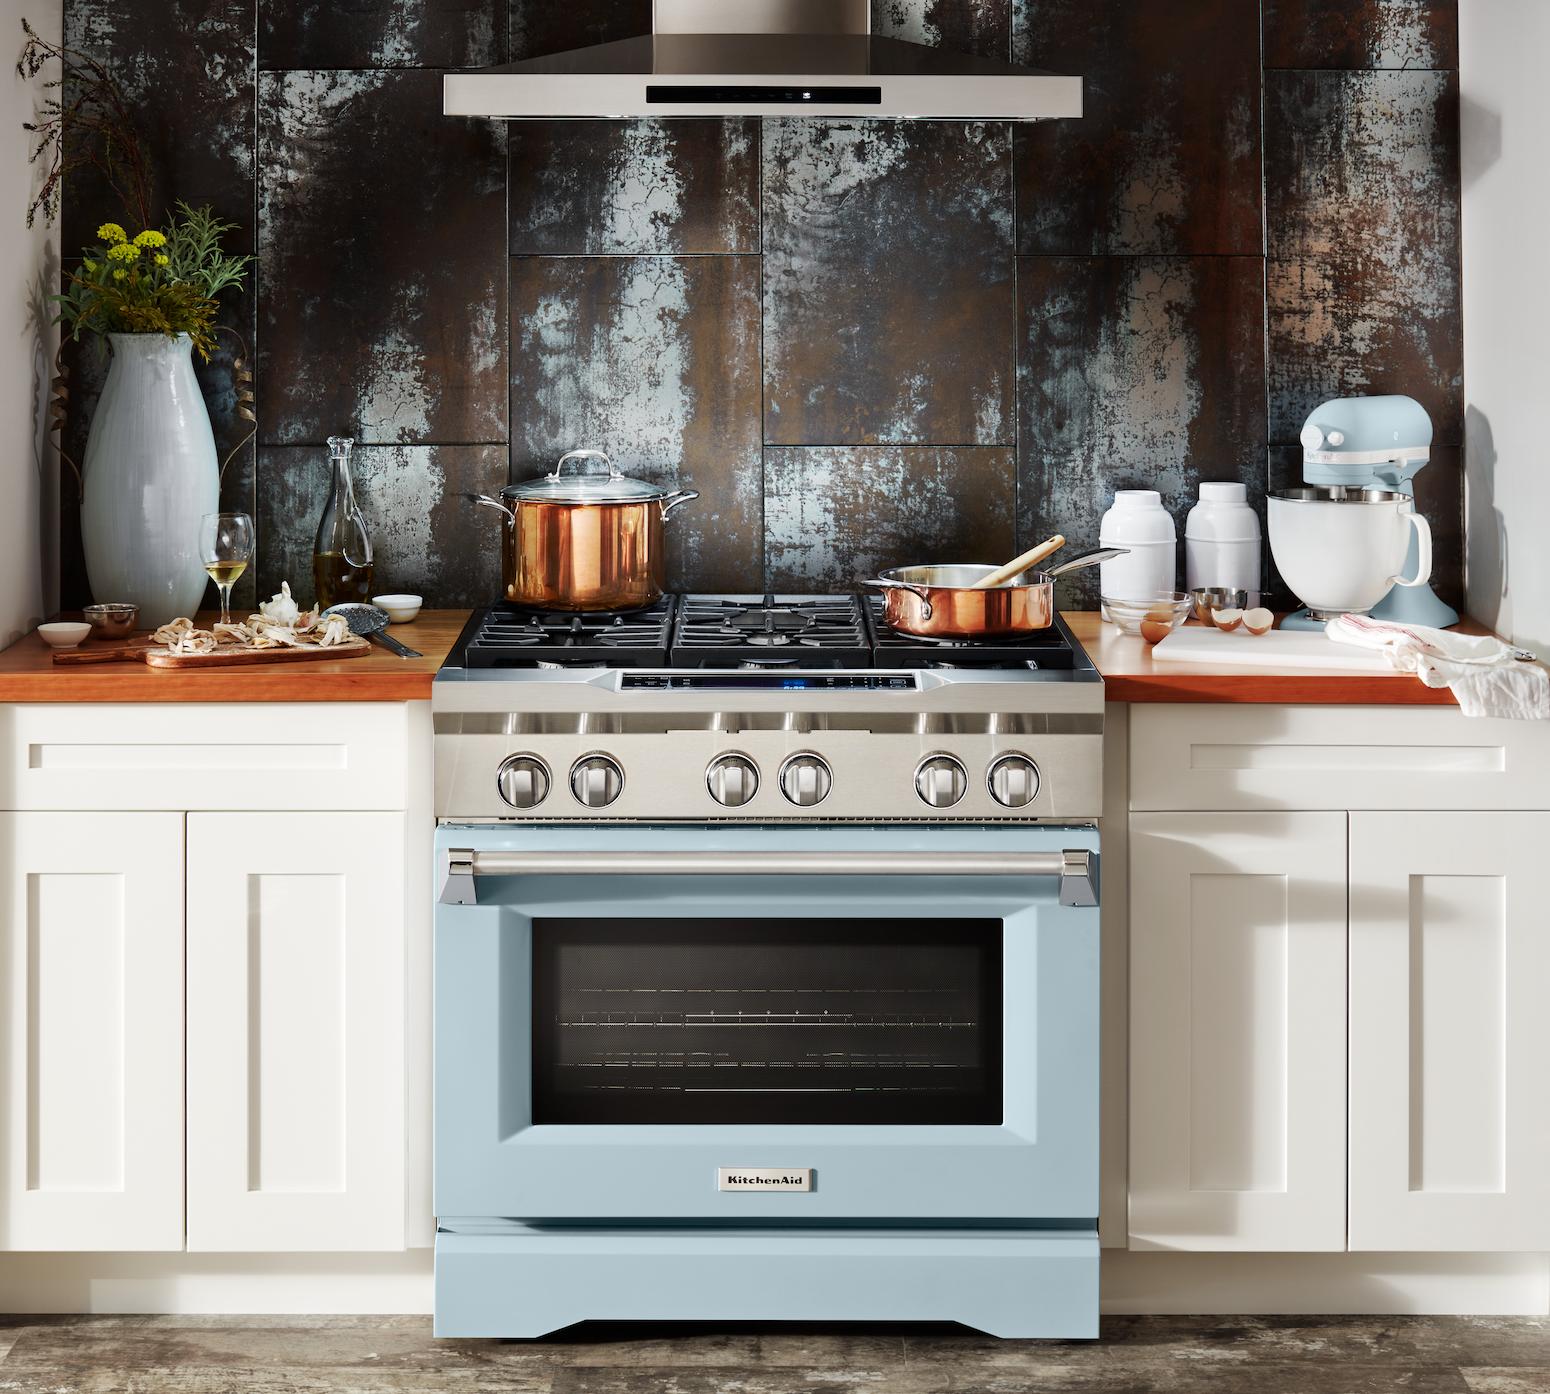 KitchenAid Released A Misty Blue Freestanding Range ...